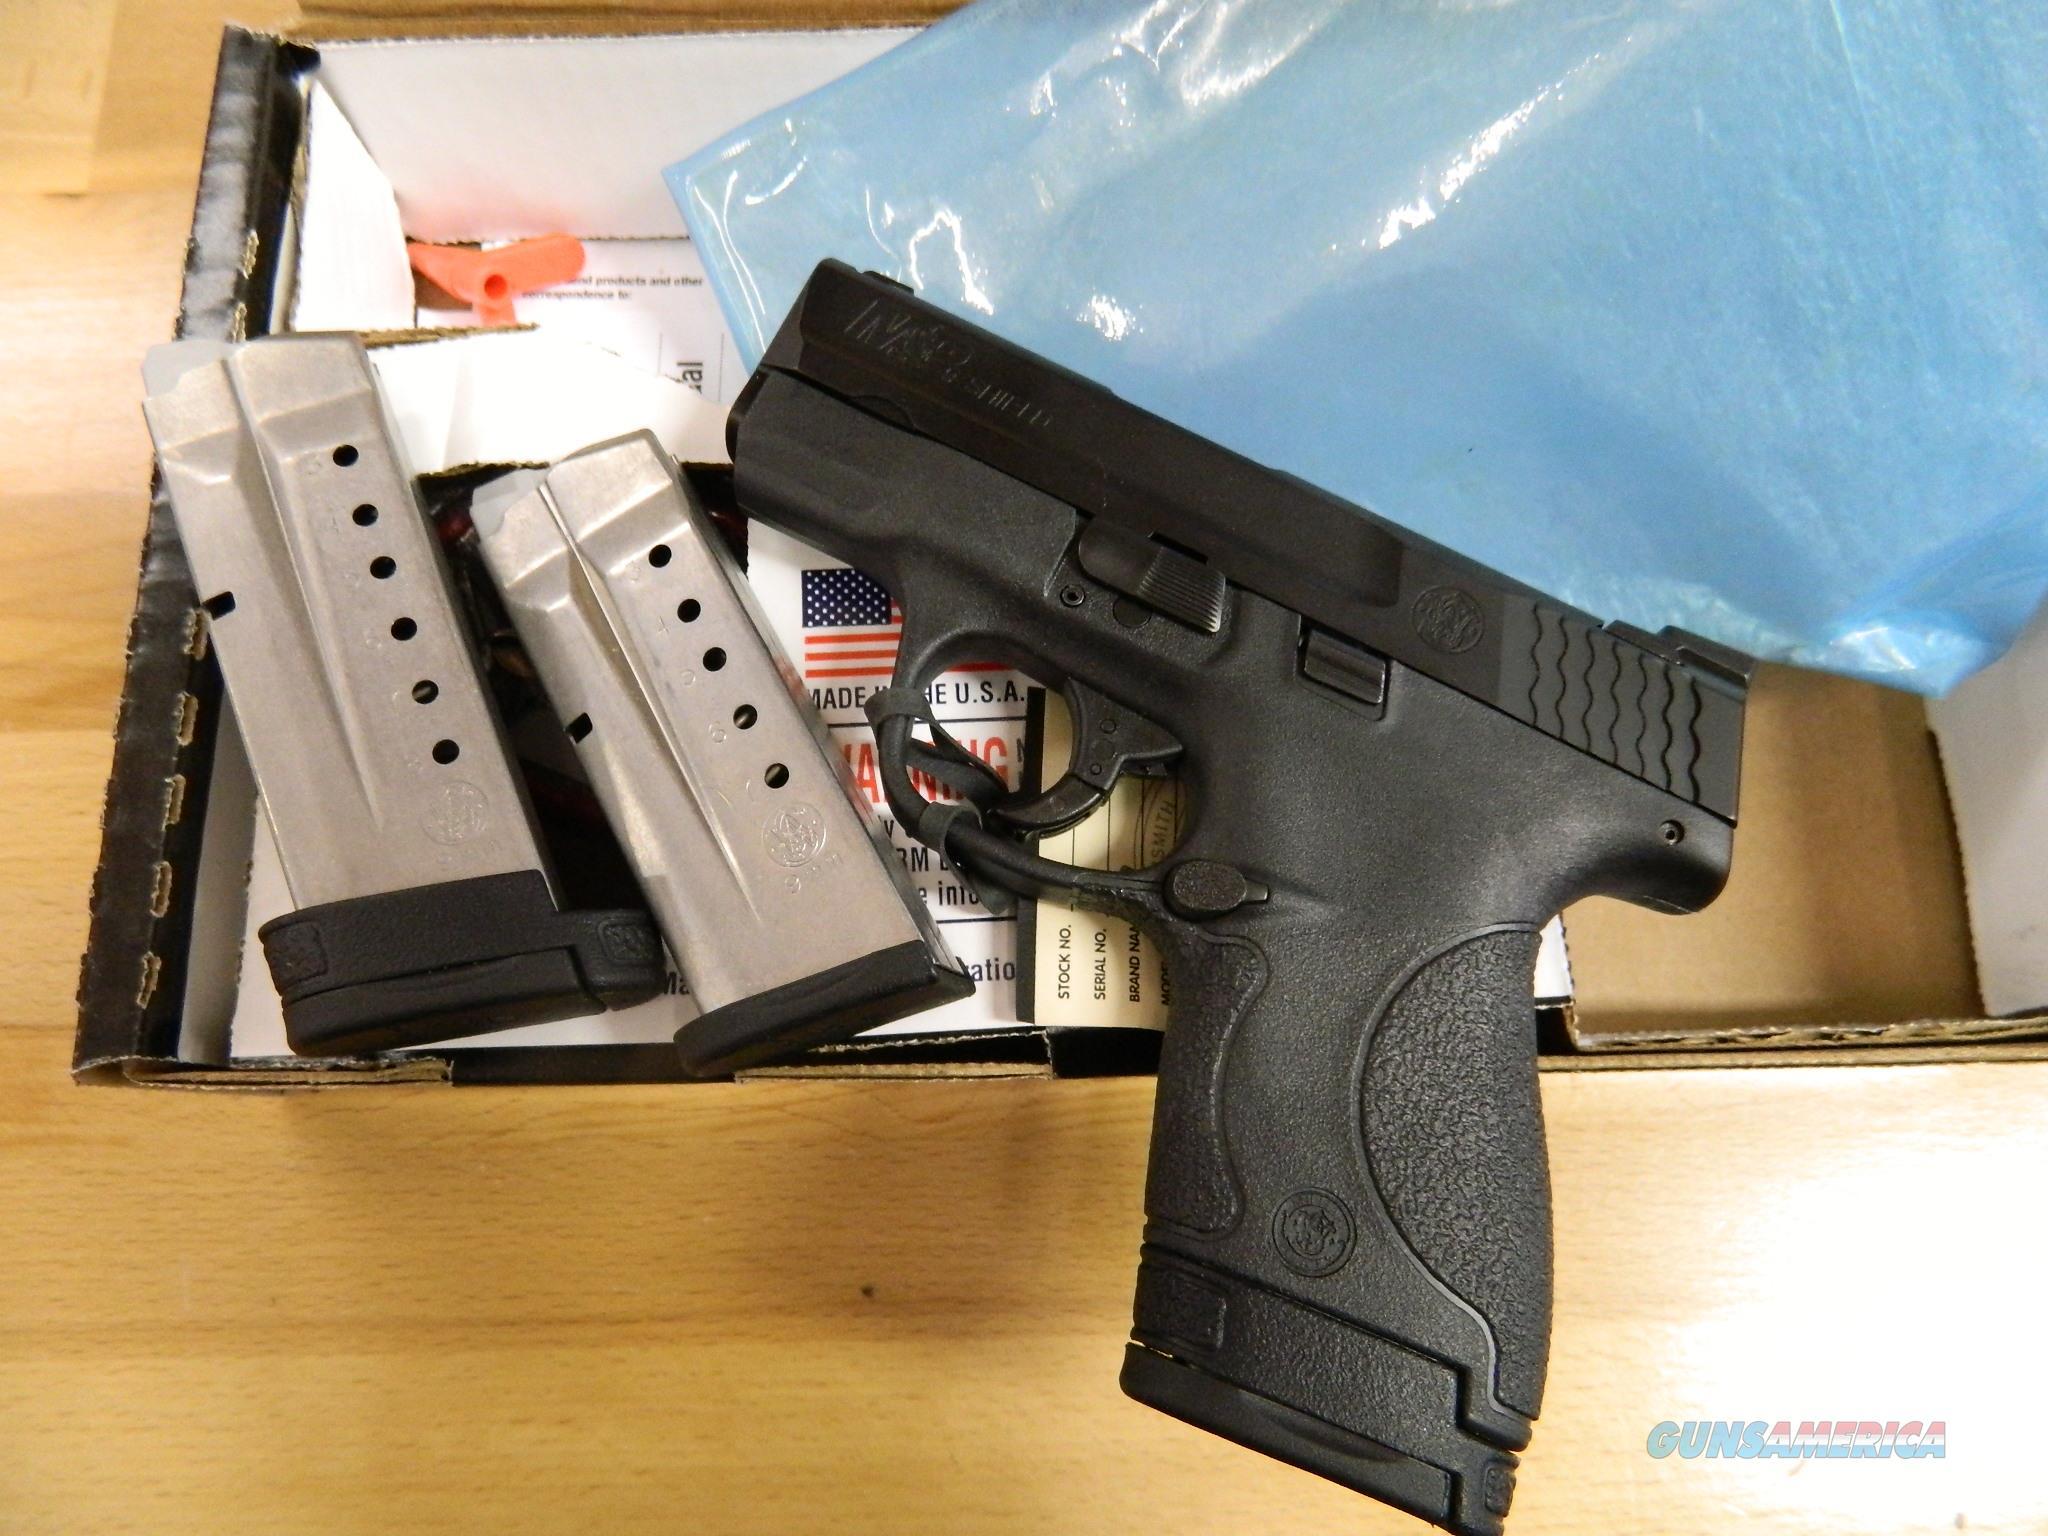 Smith & Wesson M&P9 Shield Night Sights / 9MM NIB 3 magazines  Guns > Pistols > Smith & Wesson Pistols - Autos > Shield